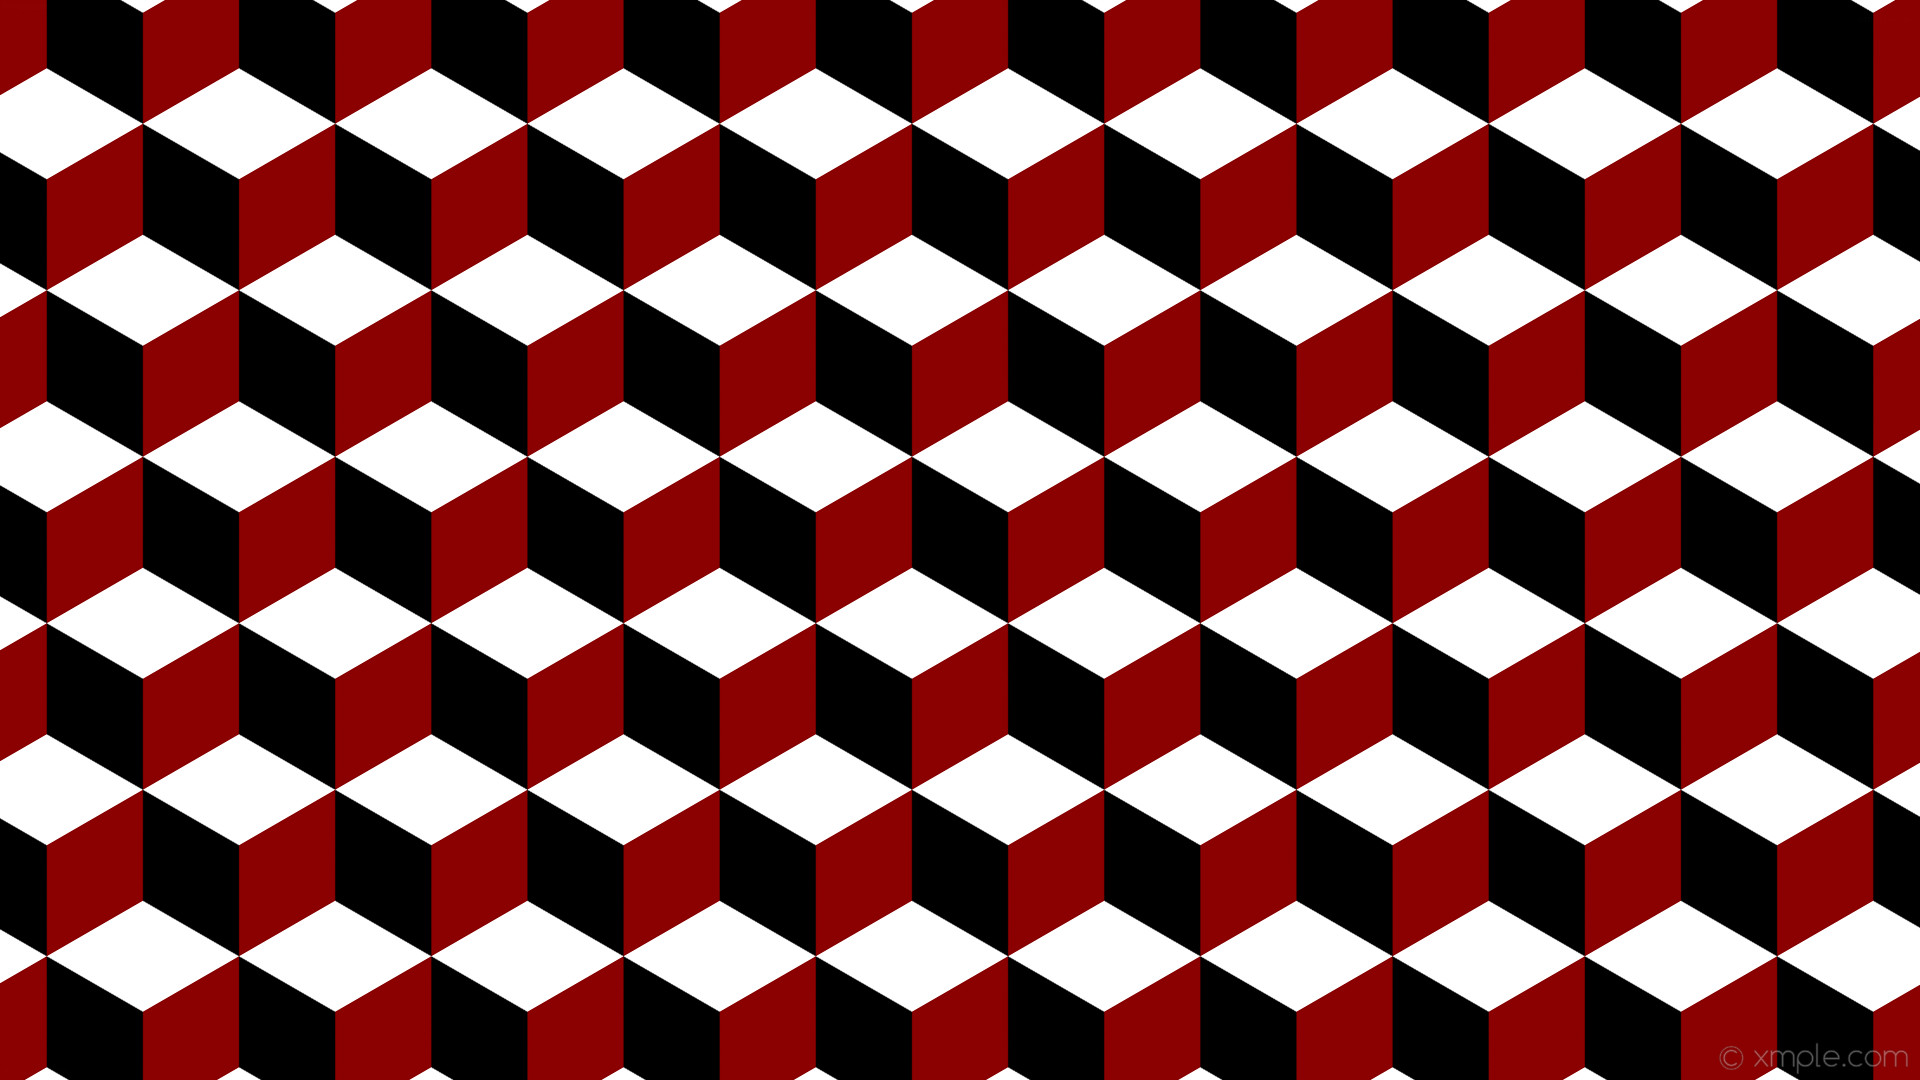 wallpaper white 3d cubes red black dark red #000000 #8b0000 #ffffff 300°